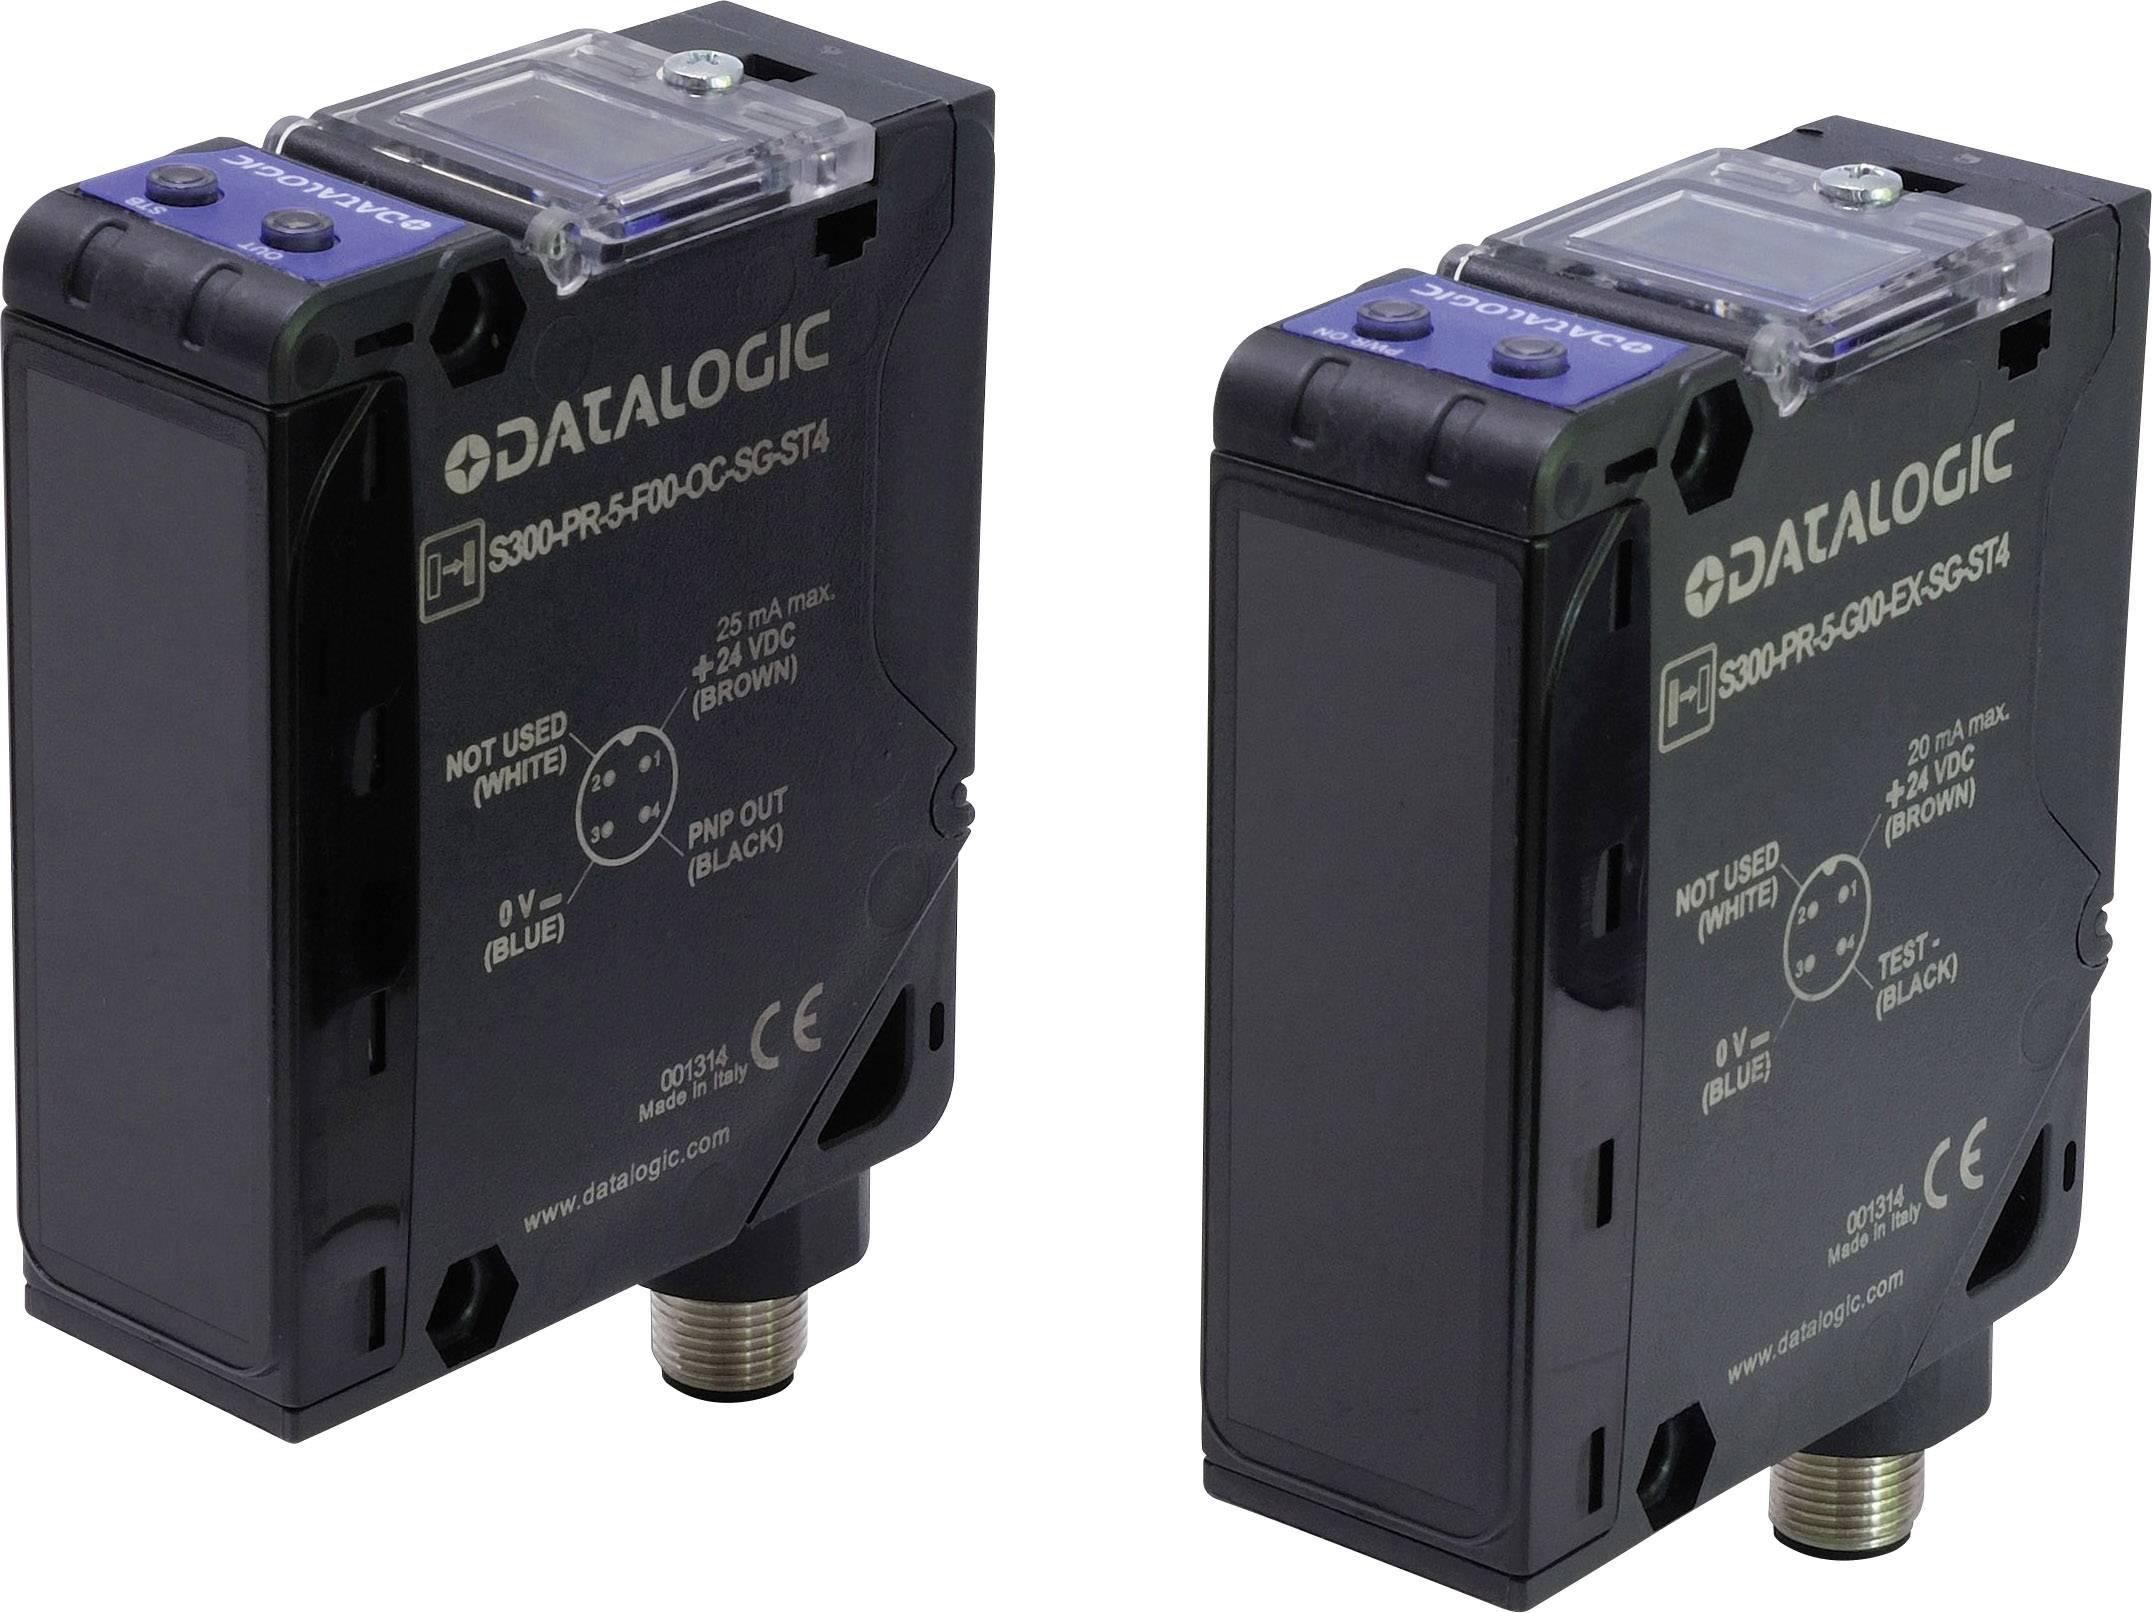 Reflexná svetelná závora DataLogic S300-PR-1-C06-RX 951451120, Max. dosah 5 m